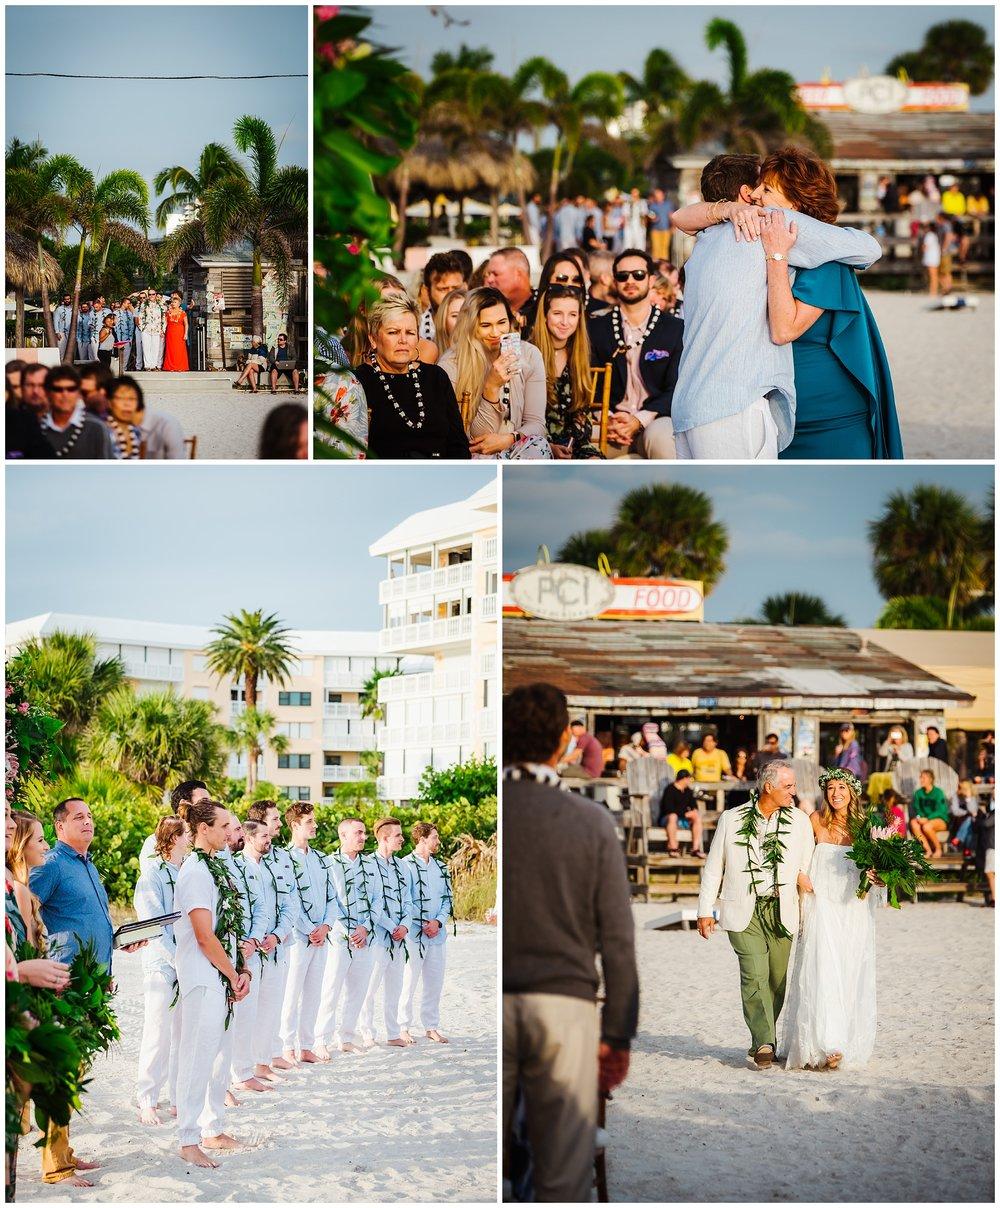 tampa-bay-wedding-photographer-barefoot-post-card-inn-tropical-hawaiin-lei-pink-pineapples-flower-crown_0167.jpg